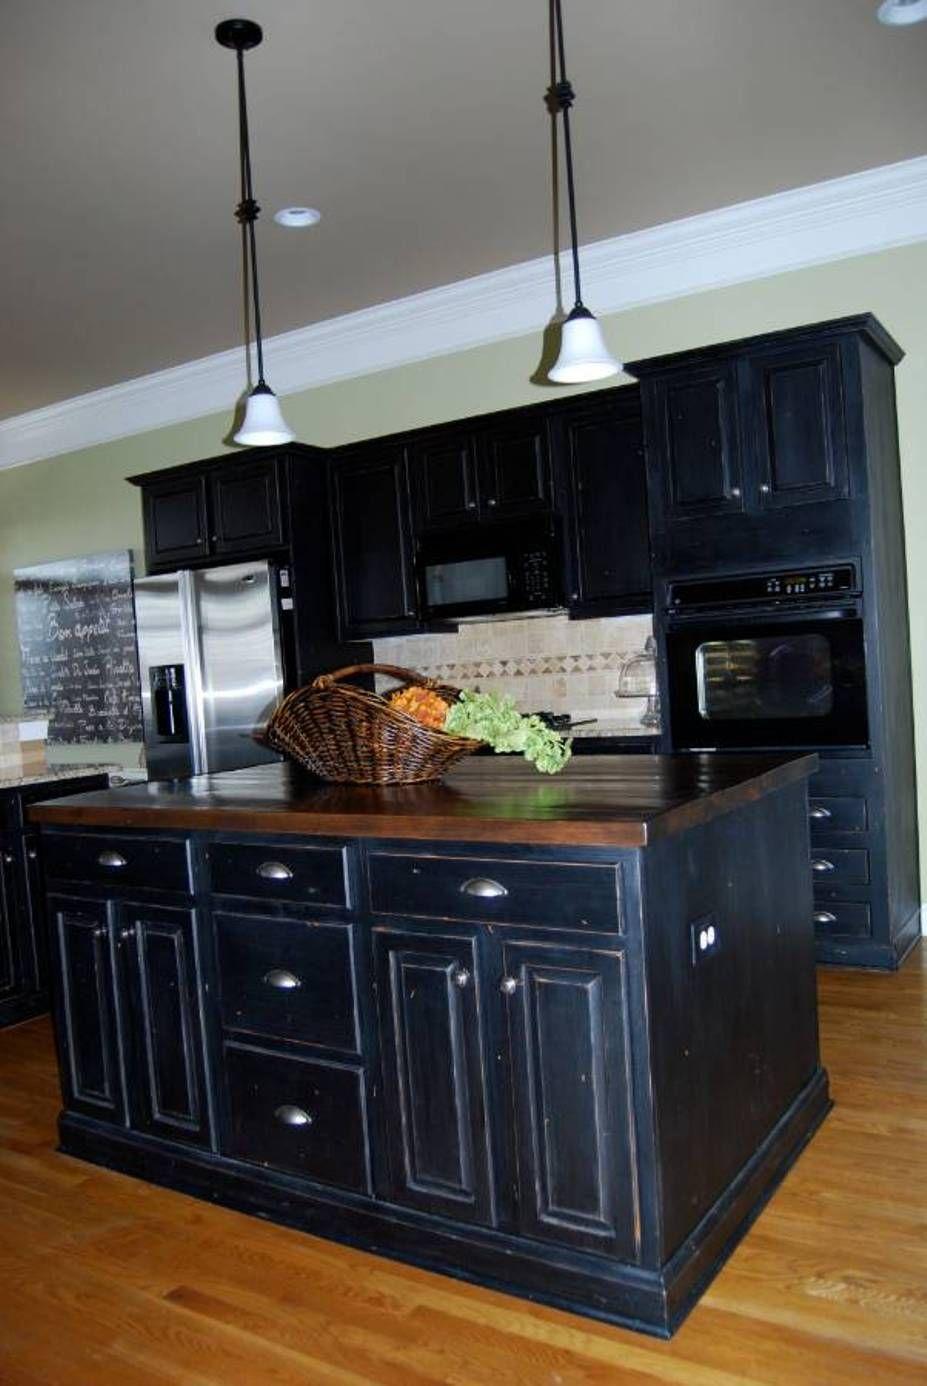 Furniture  Suave Distressed Black Kitchen Cabinets  Distressed Gorgeous Distressed Kitchen Cabinets Design Inspiration